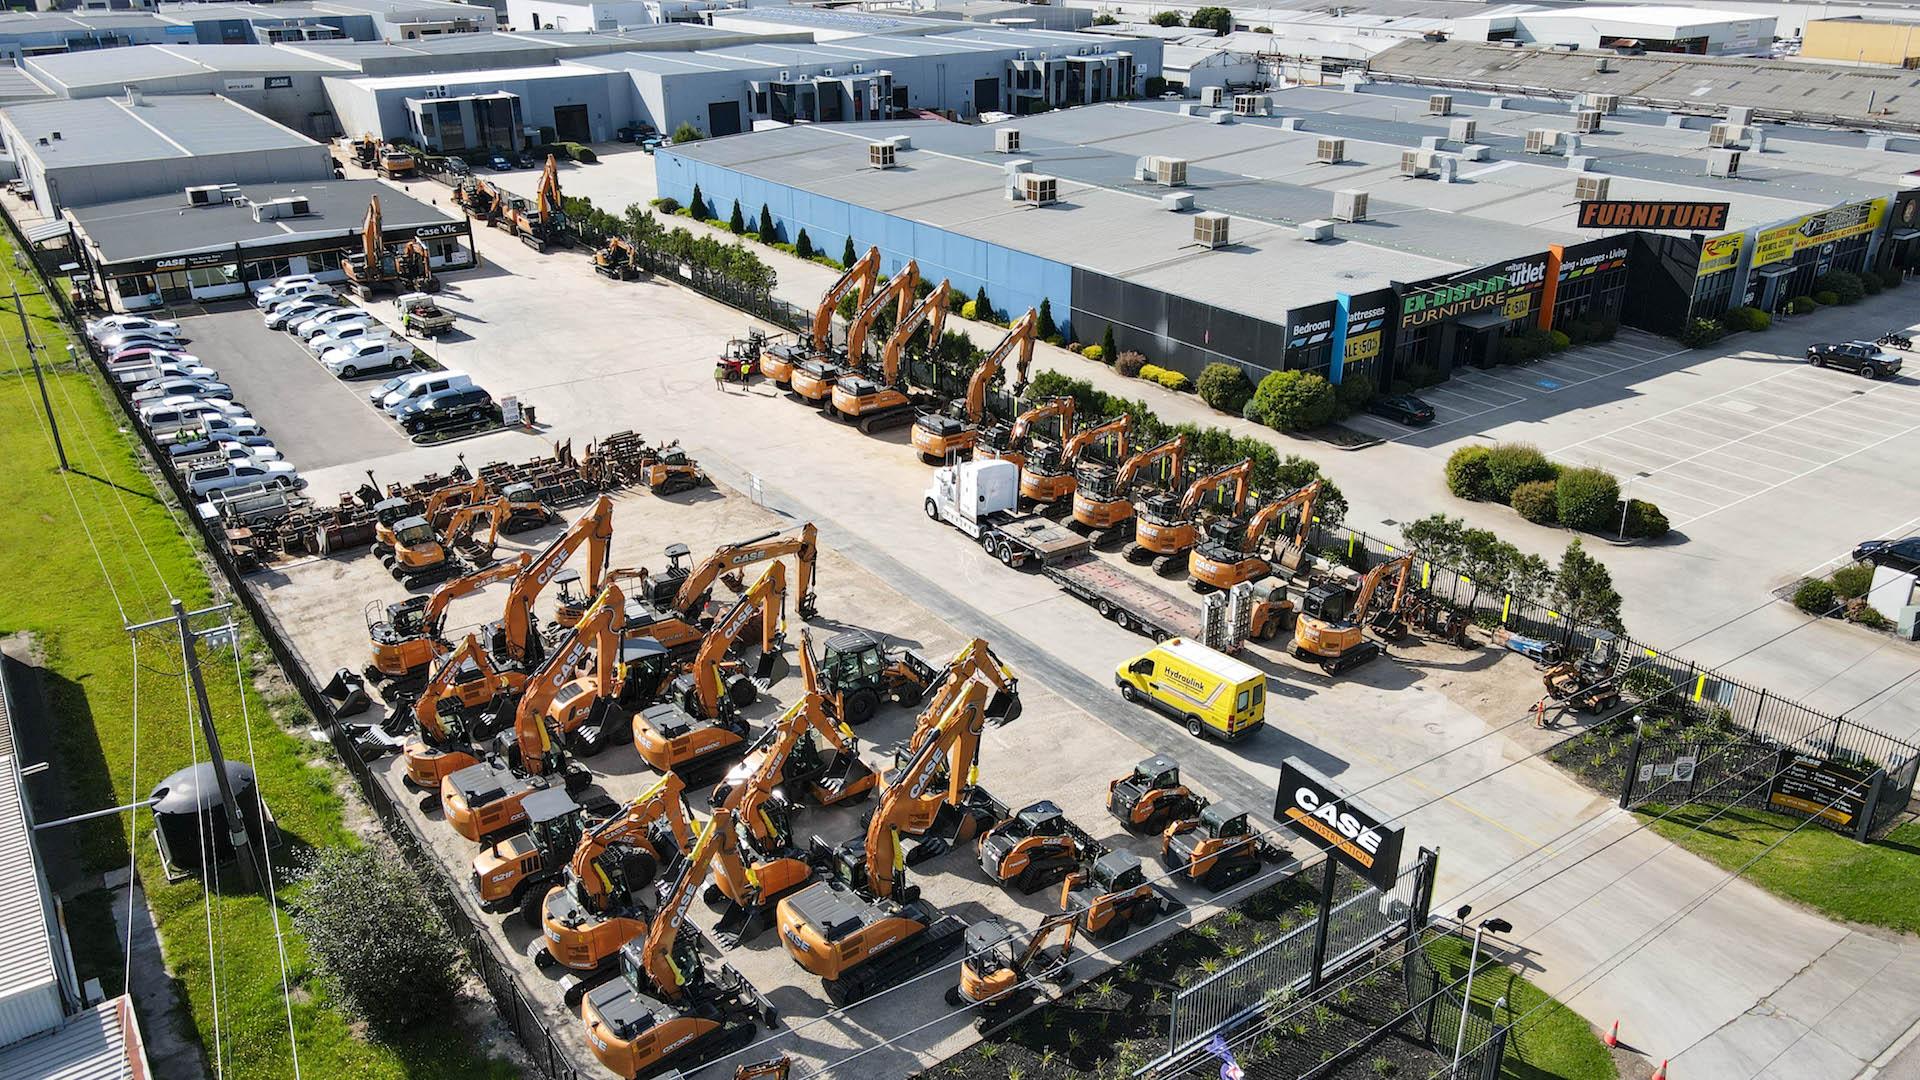 Plant Equipment for Sale & Hire - Dandenong Victoria - CASE VIC 23/04